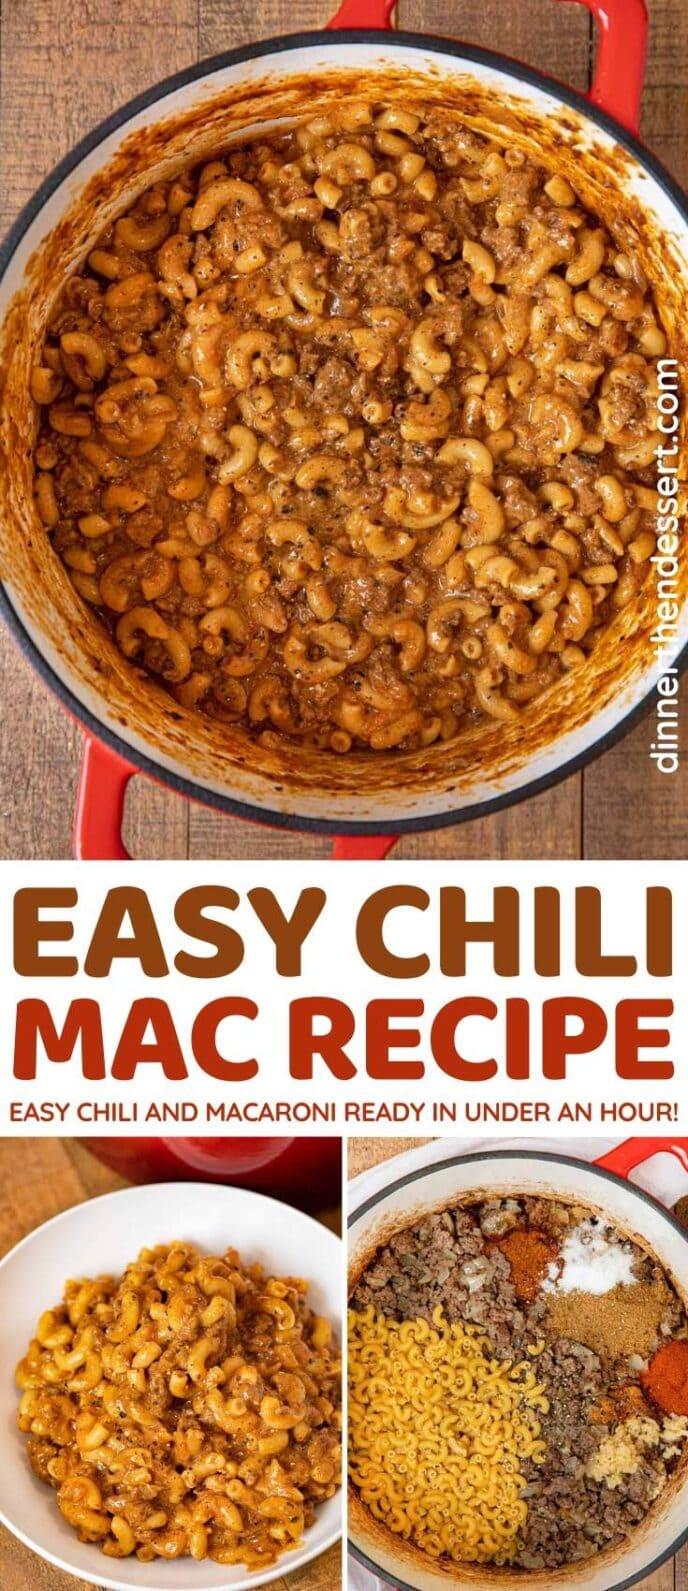 Chili Mac collage